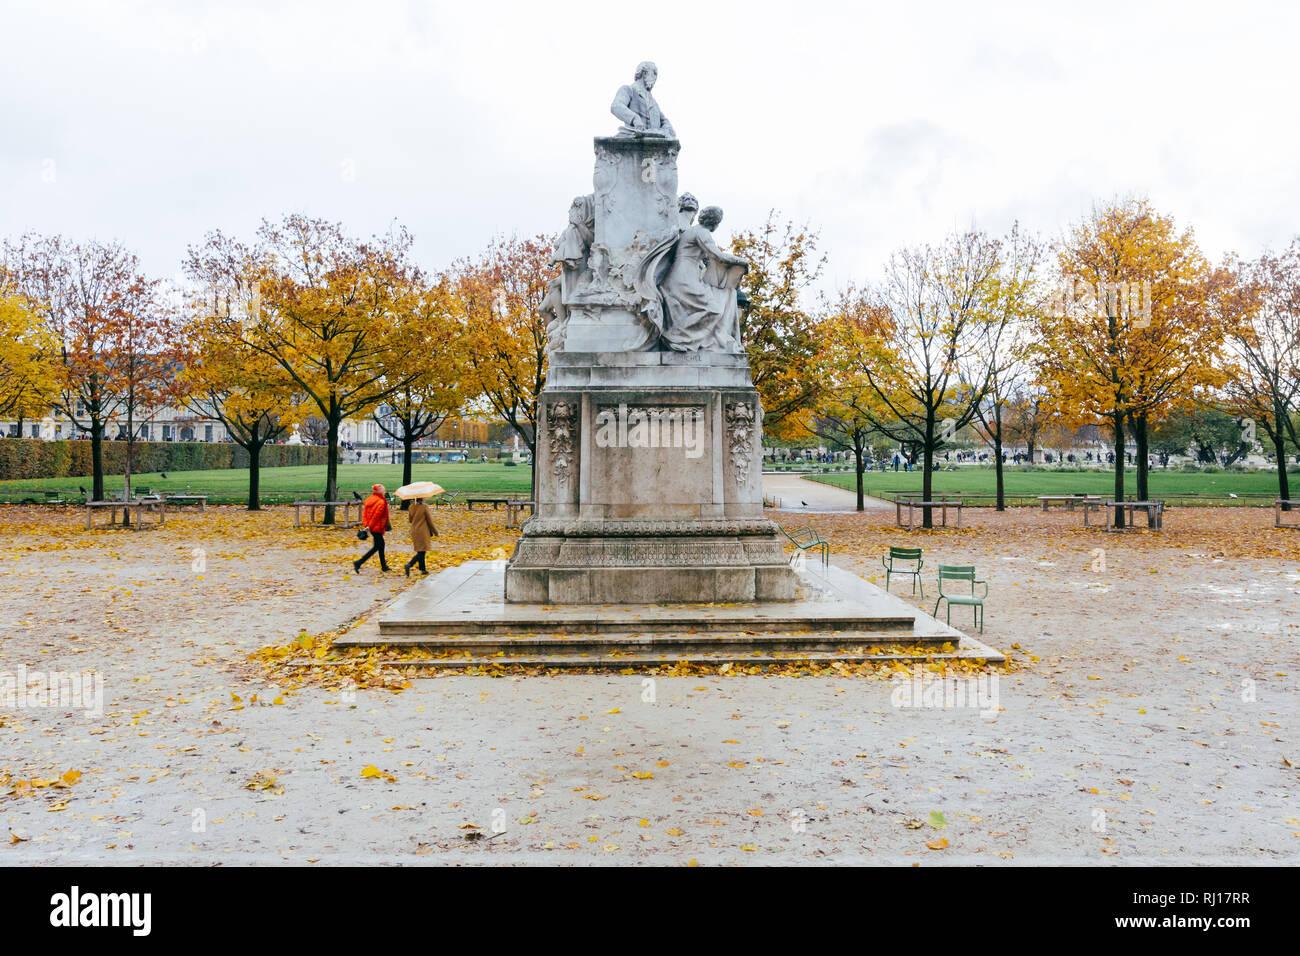 Paris (France) - Garden of Tuileries (Jardin des Tuileries) outside the Louvre Stock Photo